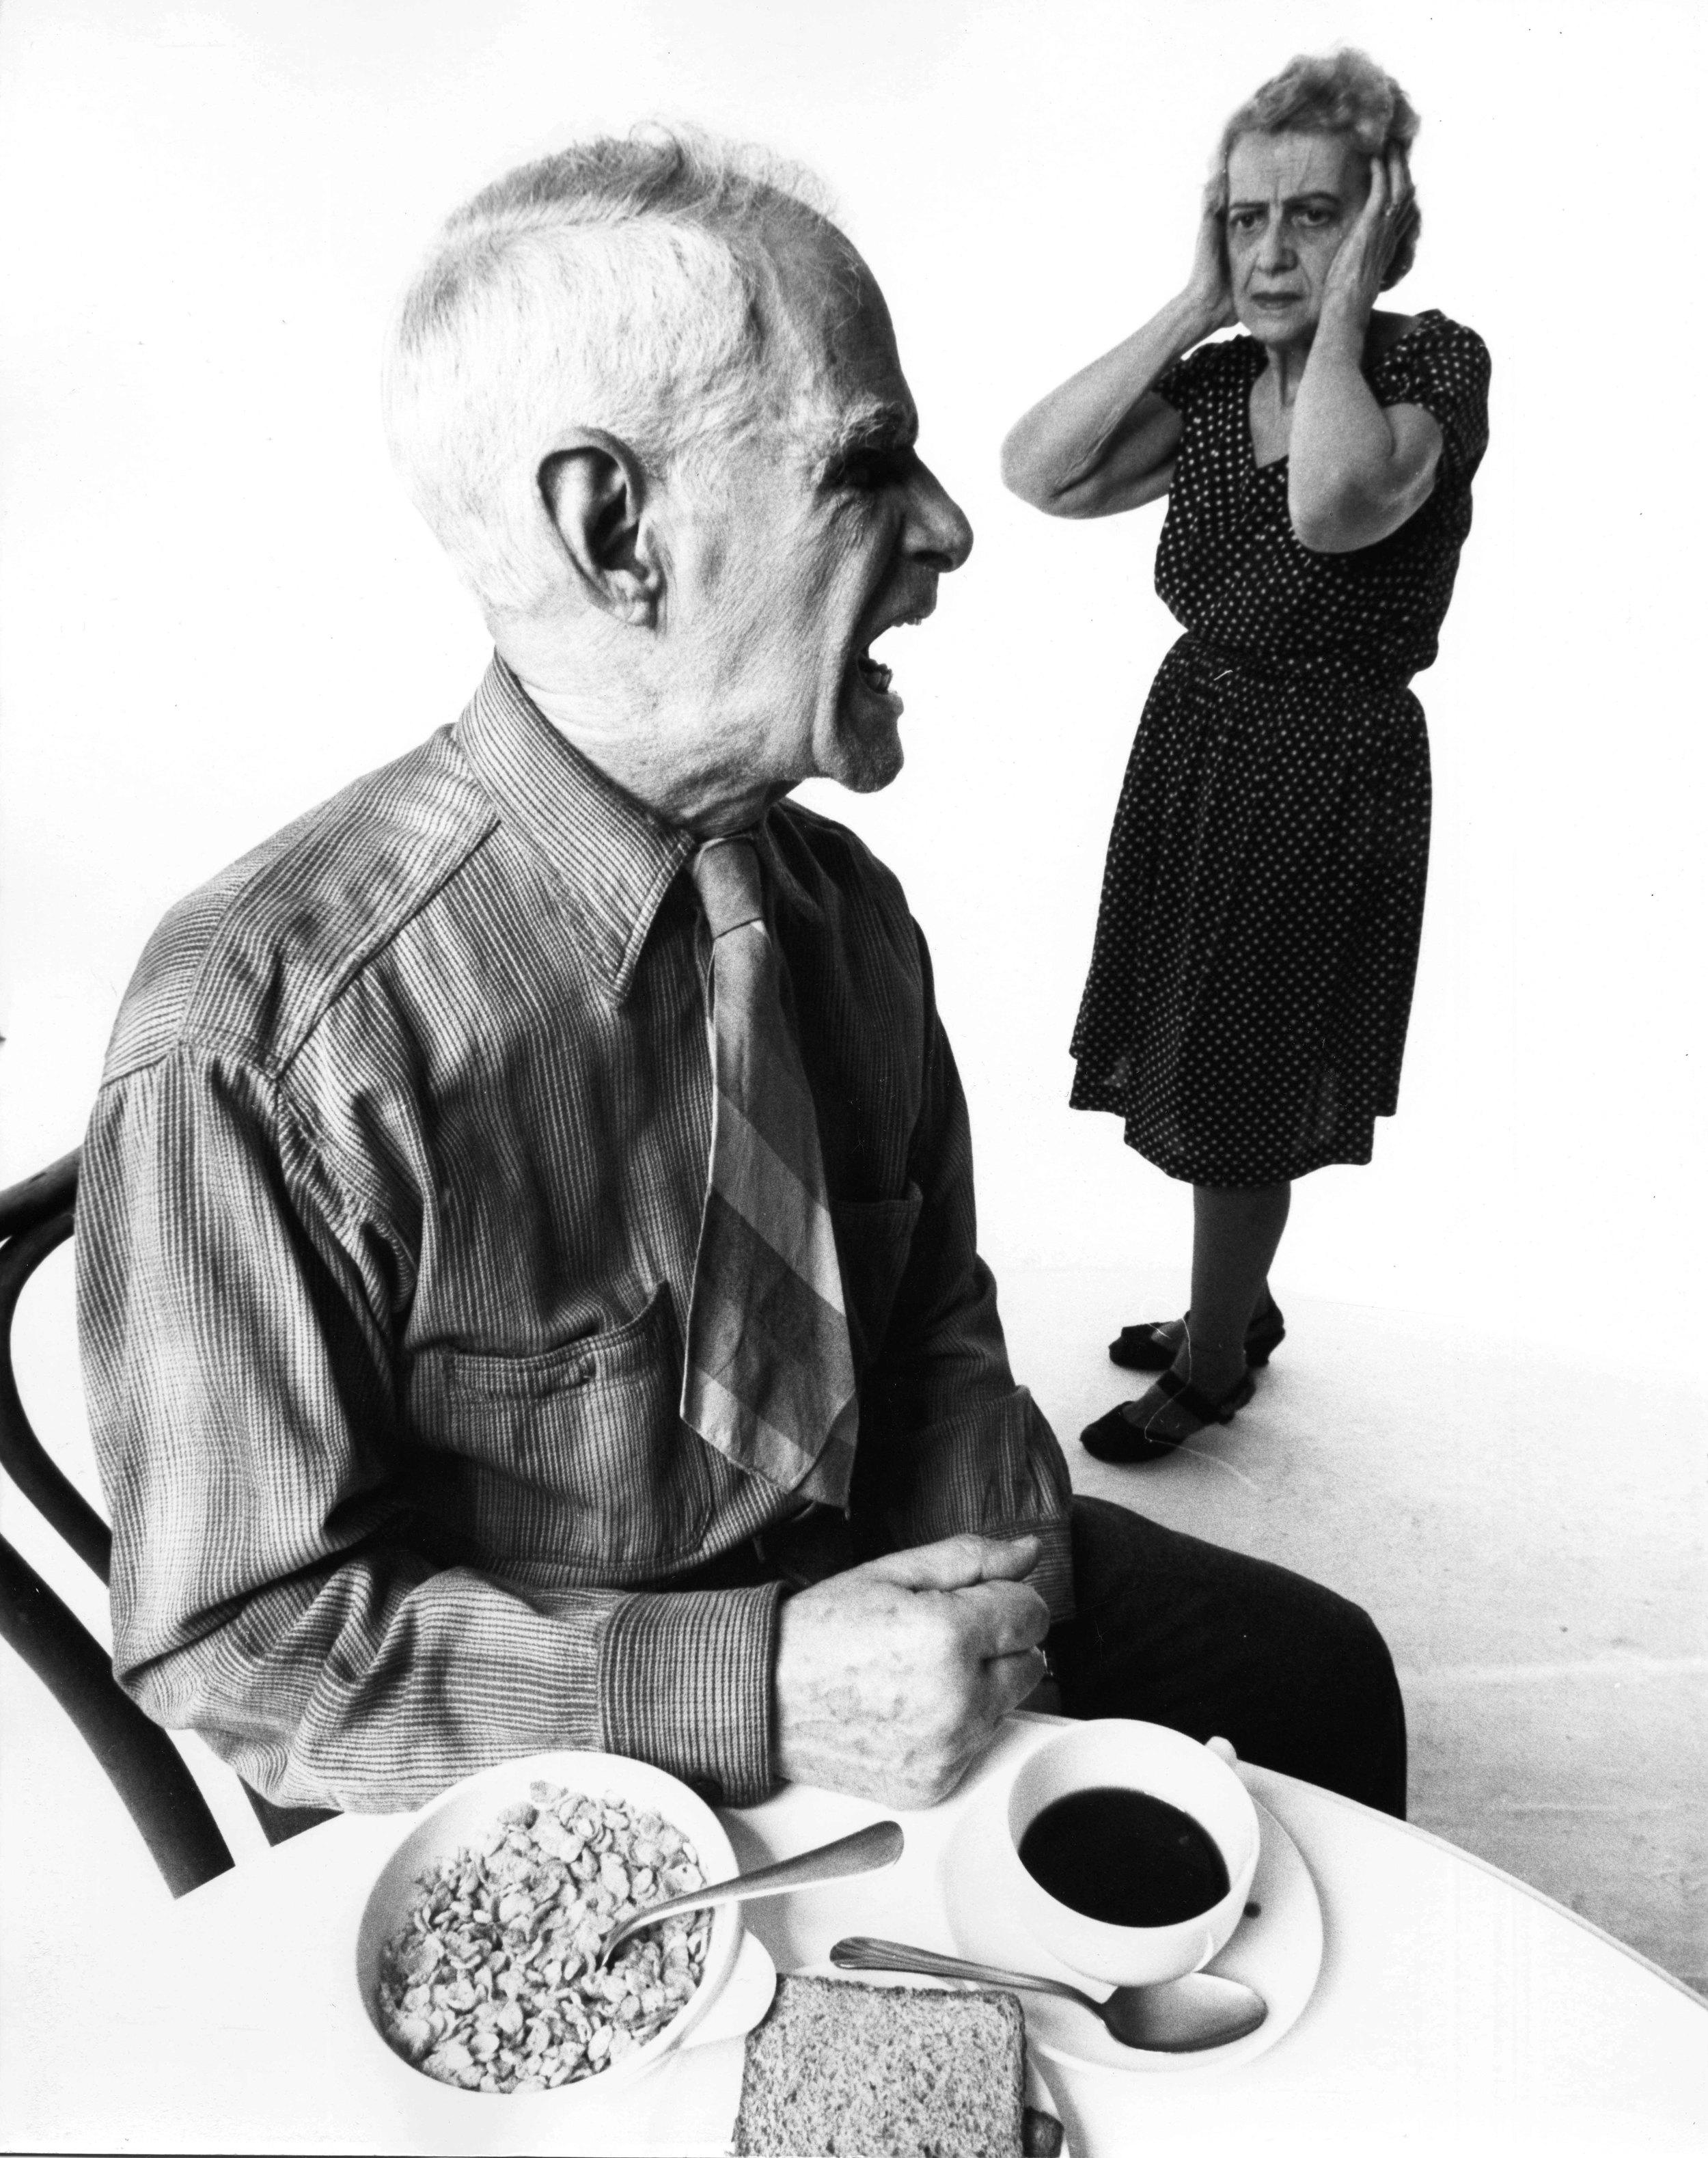 16_20_Frustrated old couple #2_Dan Wynn Archive.jpeg